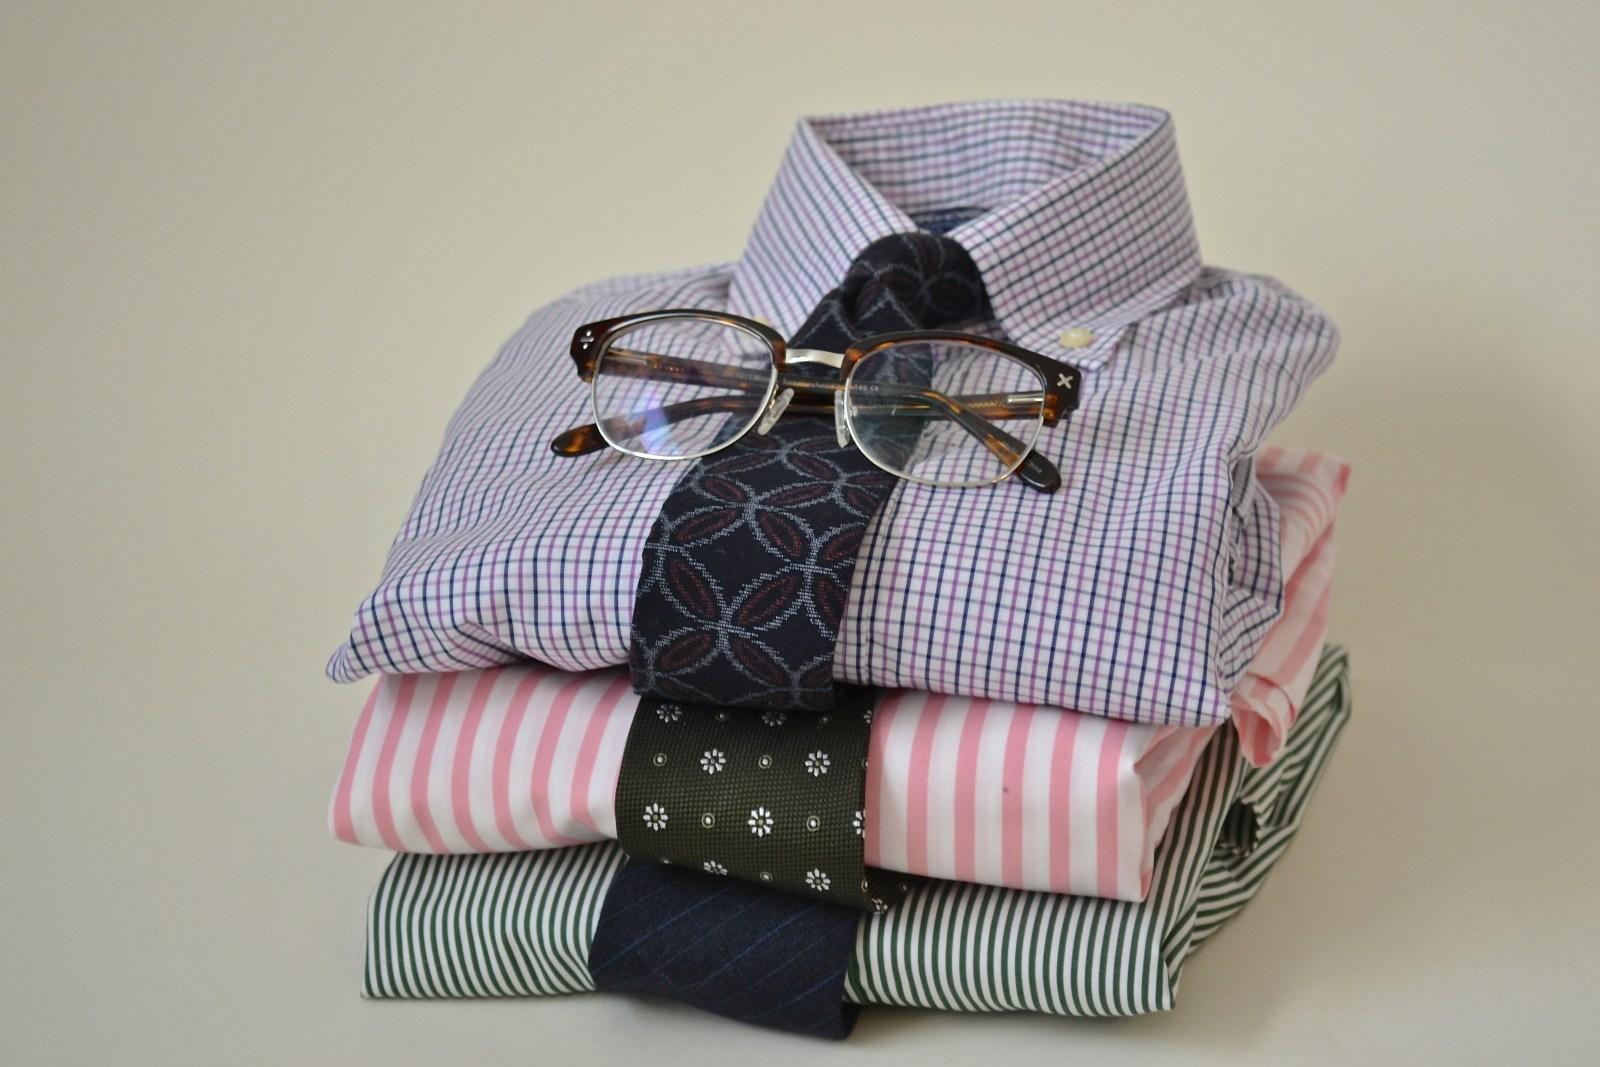 hucklebury shirts via men's style pro